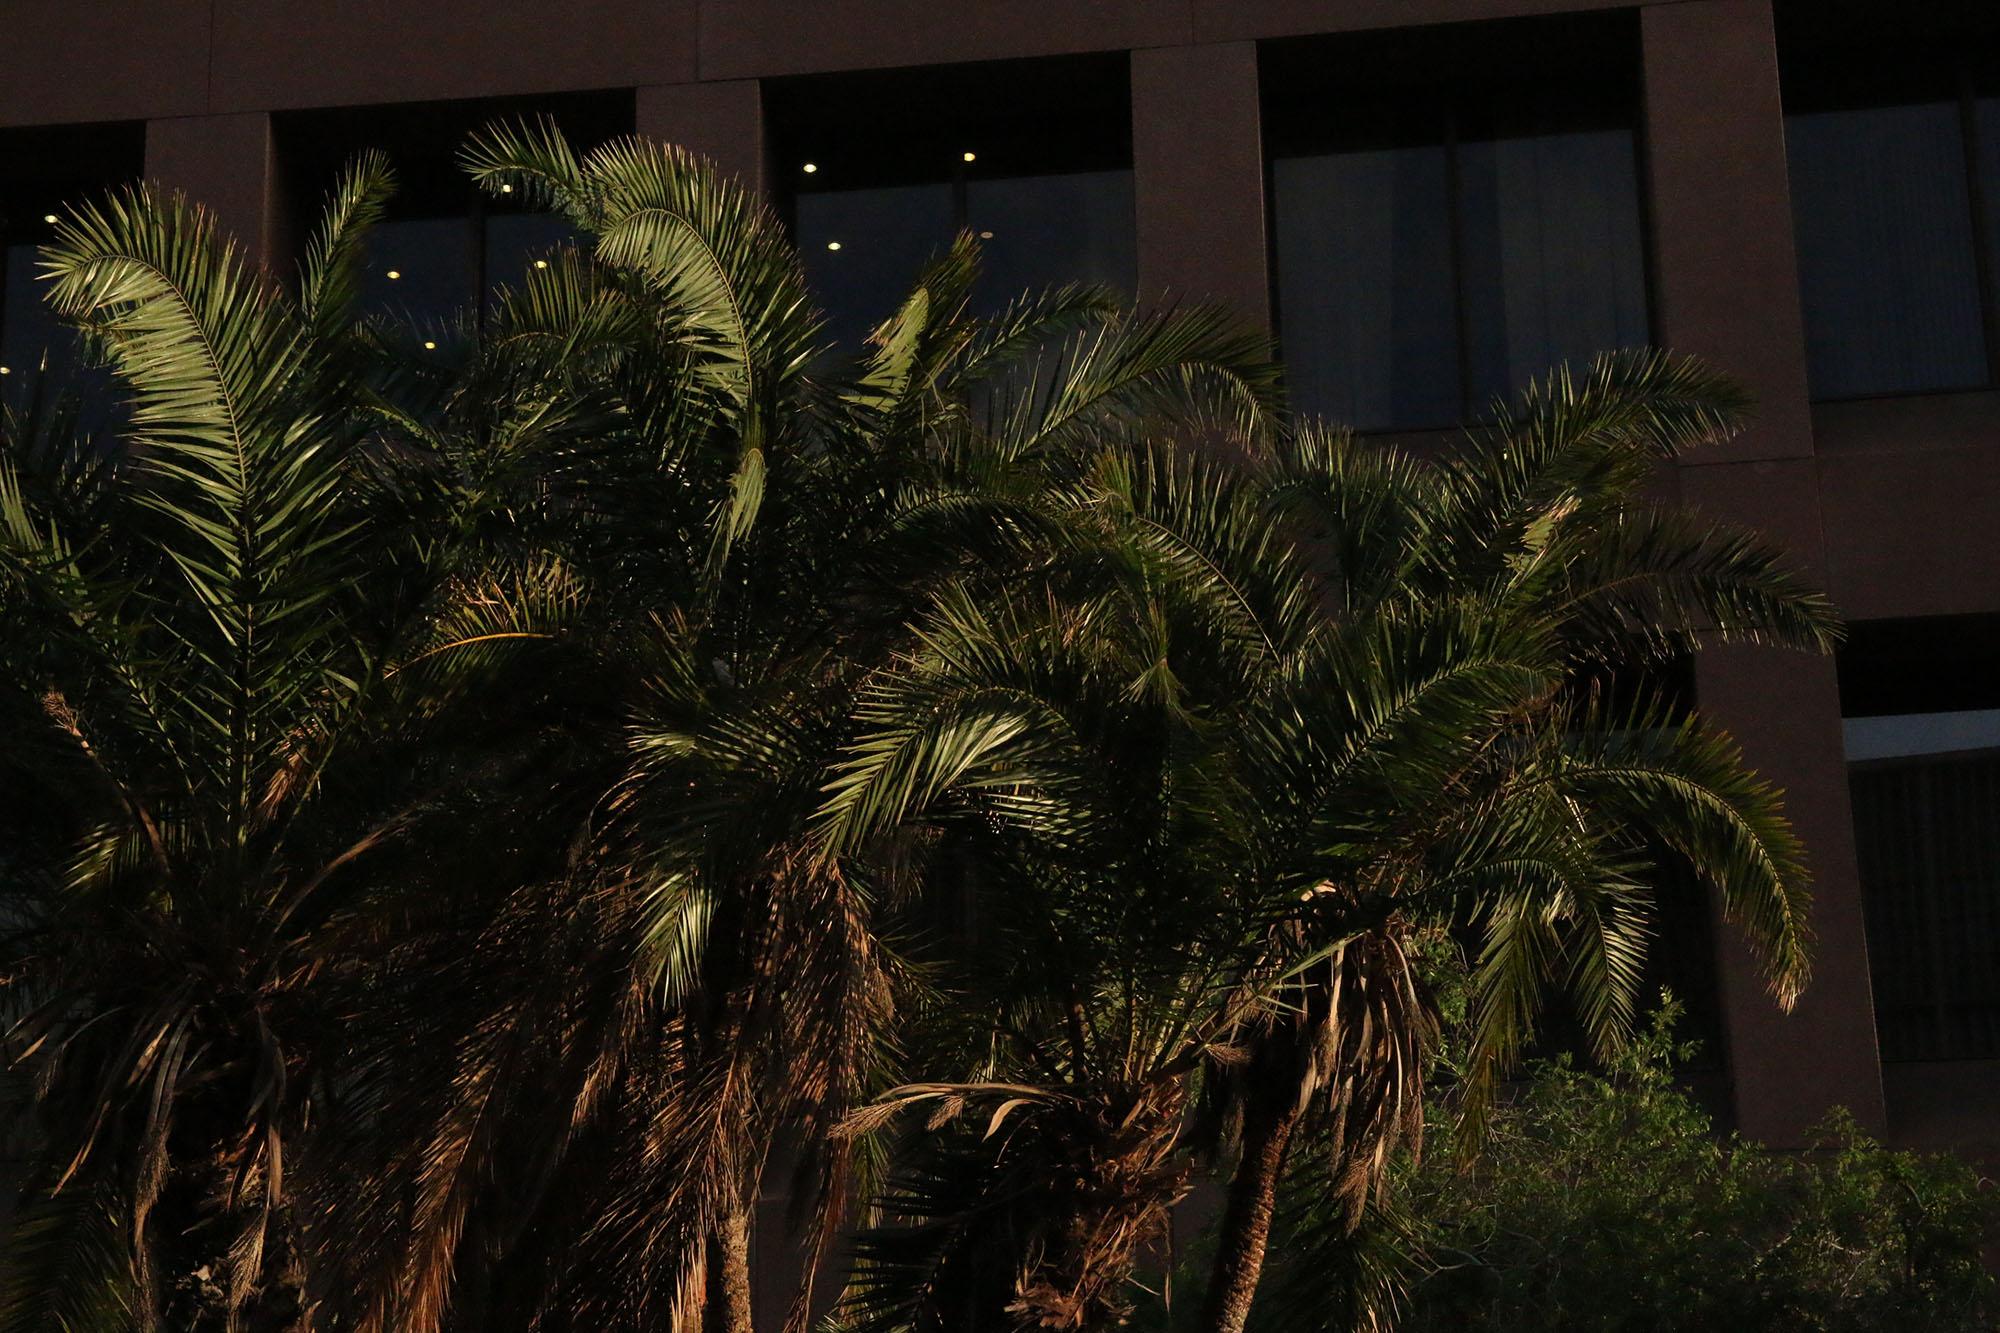 IMG_2428 san diego palmer x